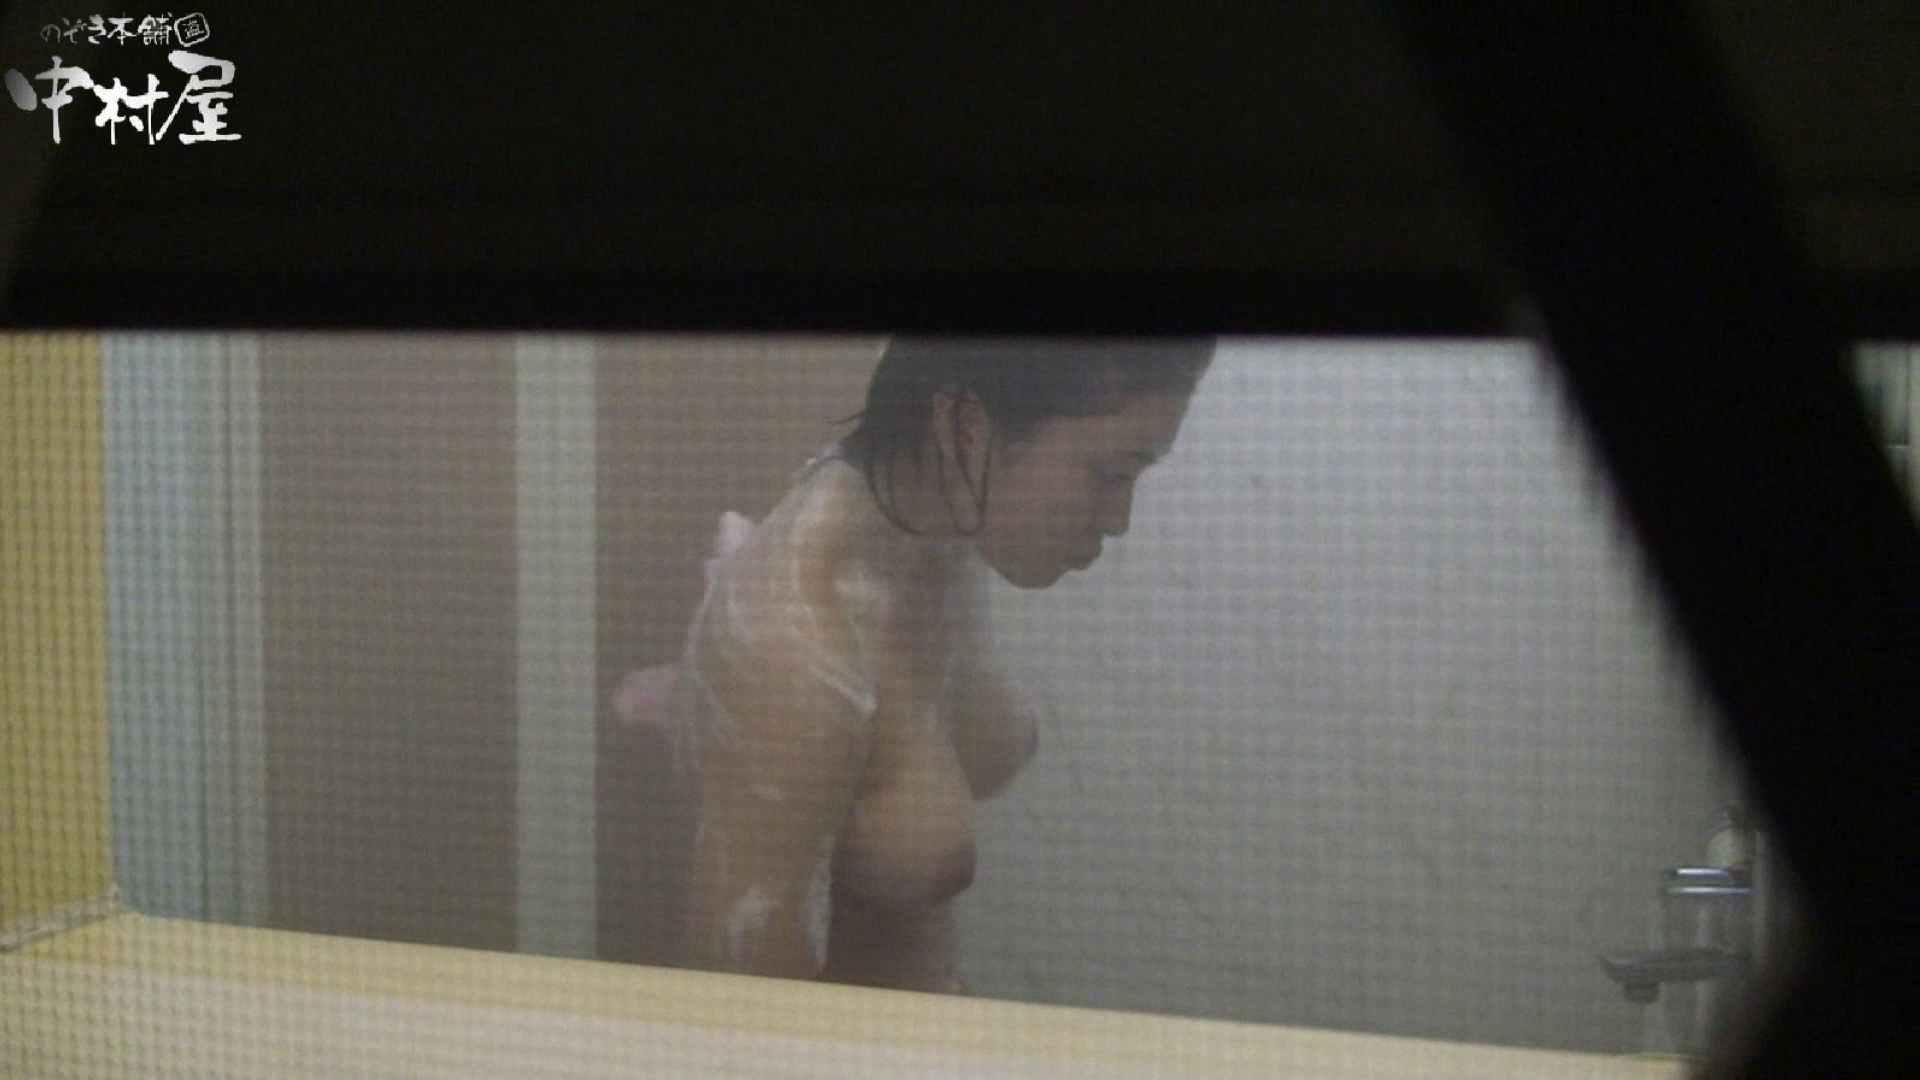 民家風呂専門盗撮師の超危険映像 vol.027 盗撮 えろ無修正画像 112枚 63